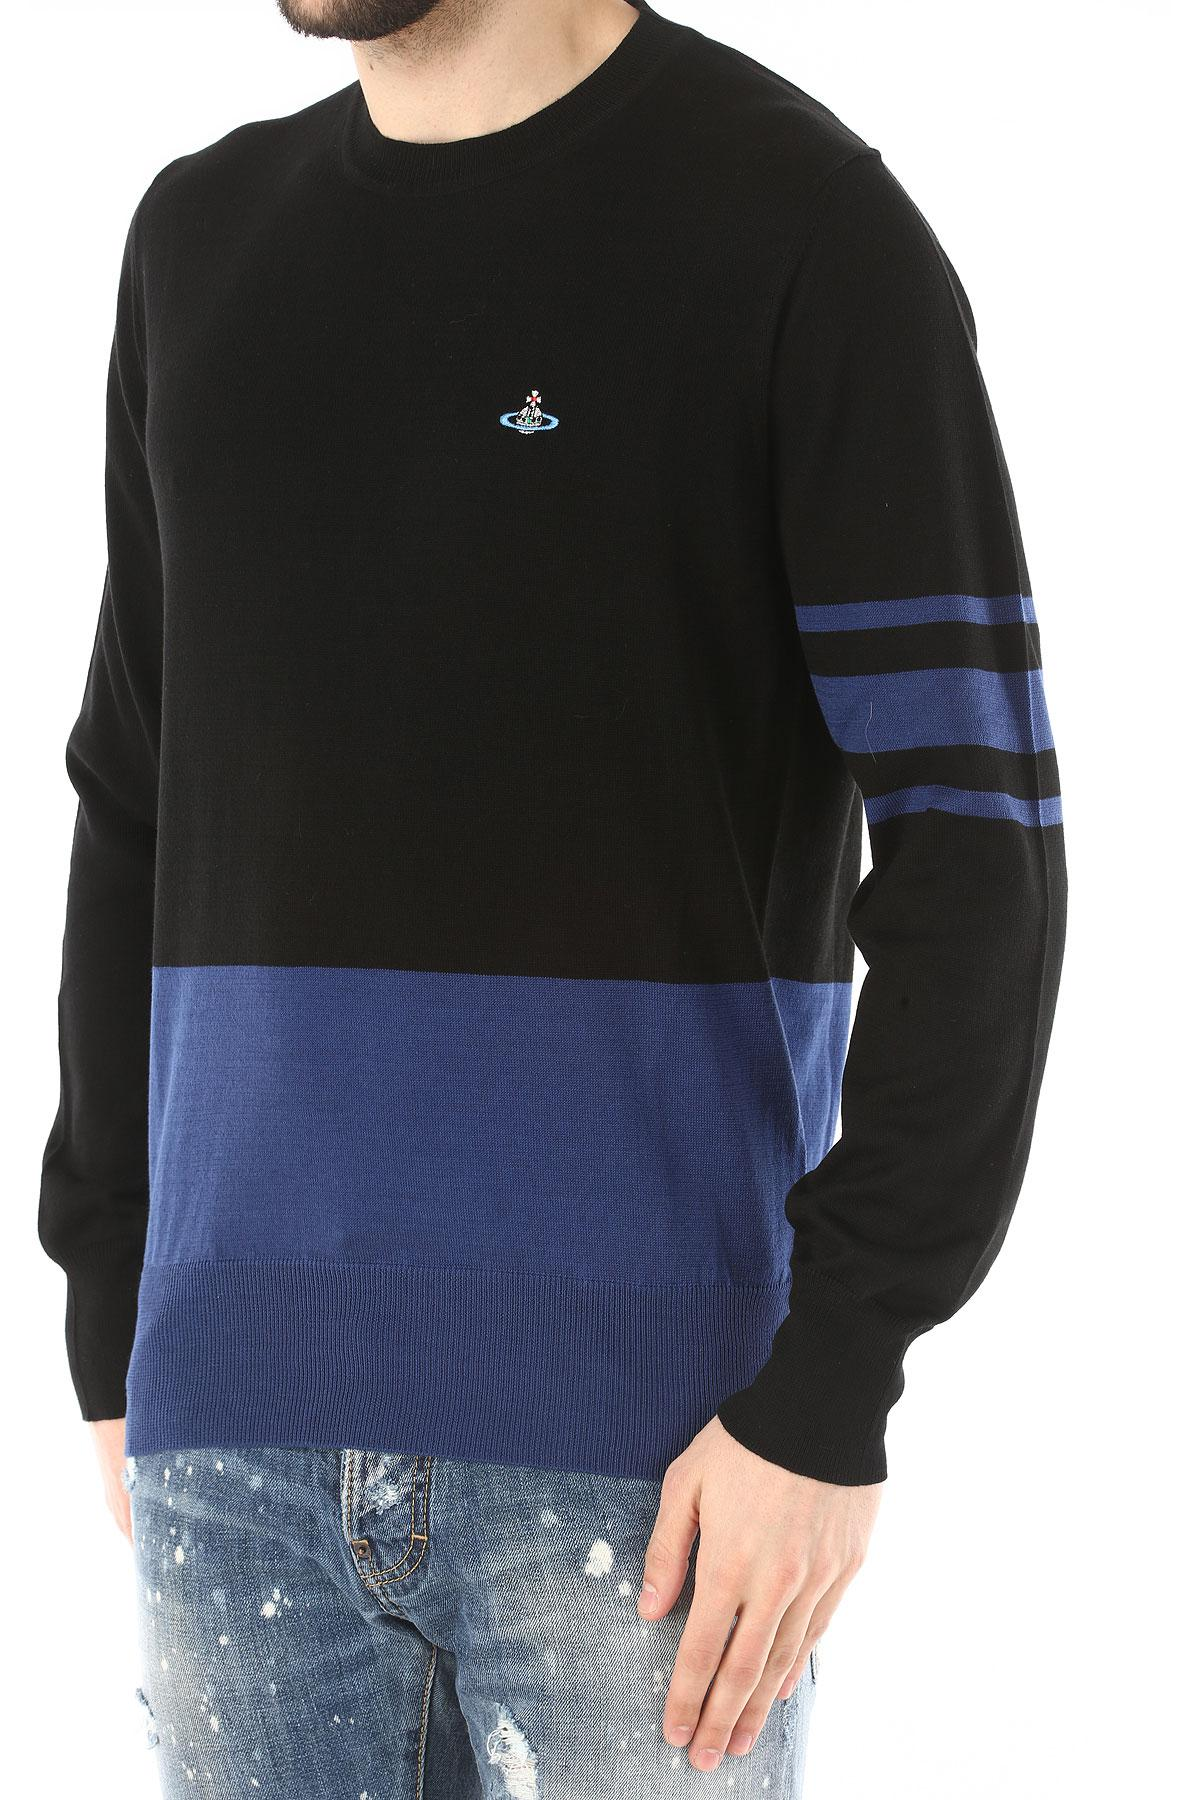 Vivienne Westwood - Blue Sweater For Men Jumper On Sale for Men - Lyst.  View fullscreen a71e3cd11